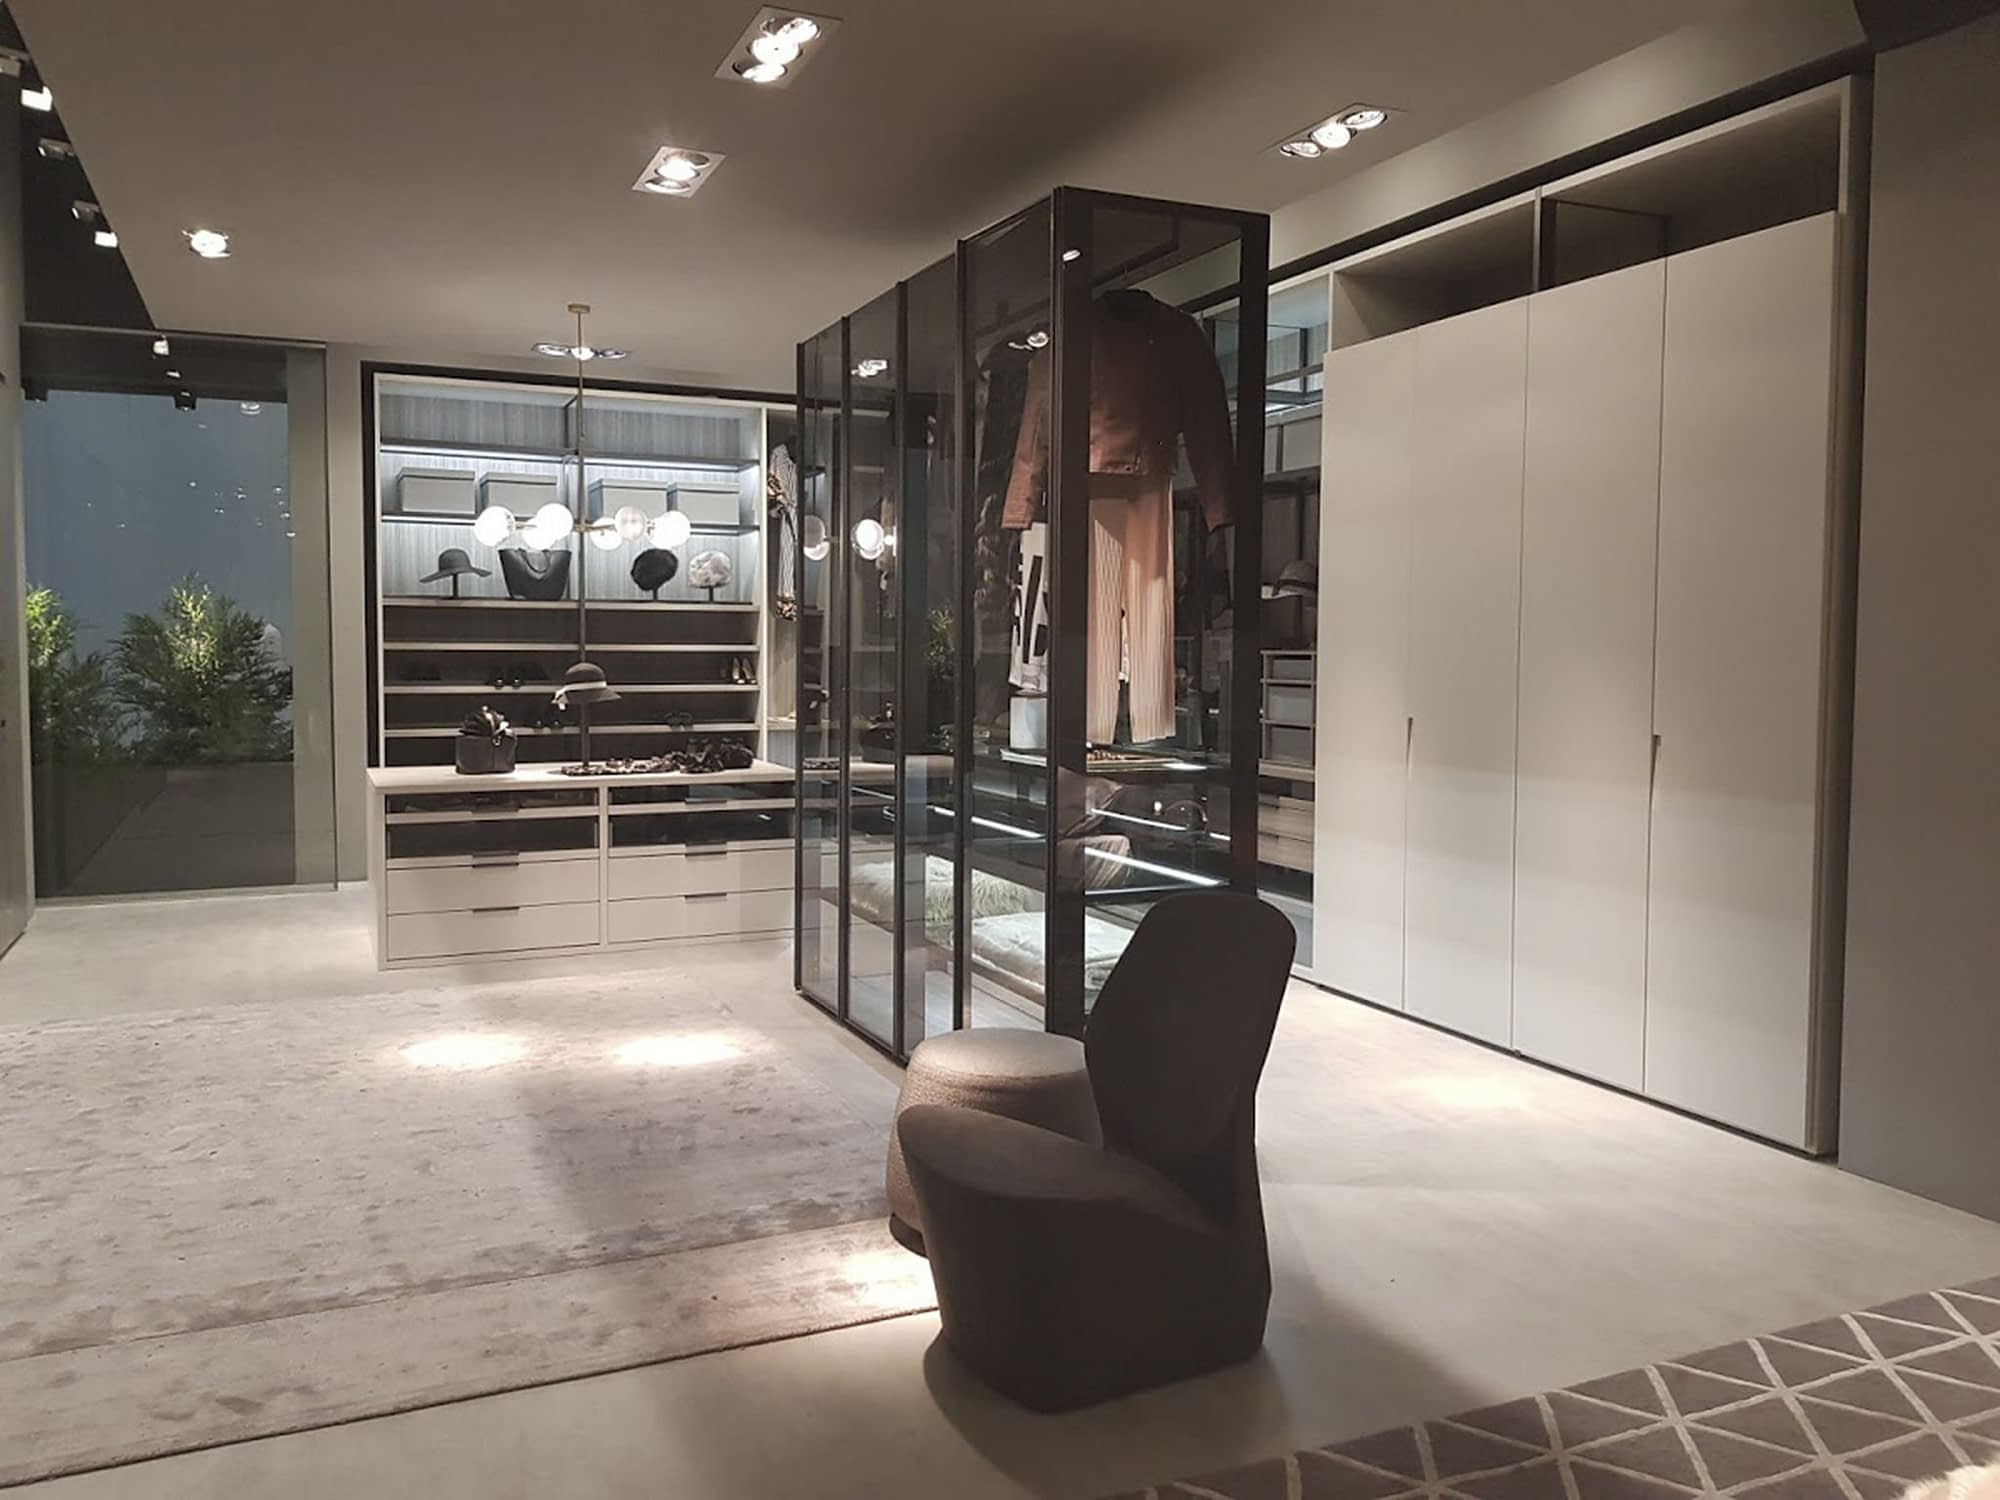 Milano Design Week 2018 - Salone del Mobile 57